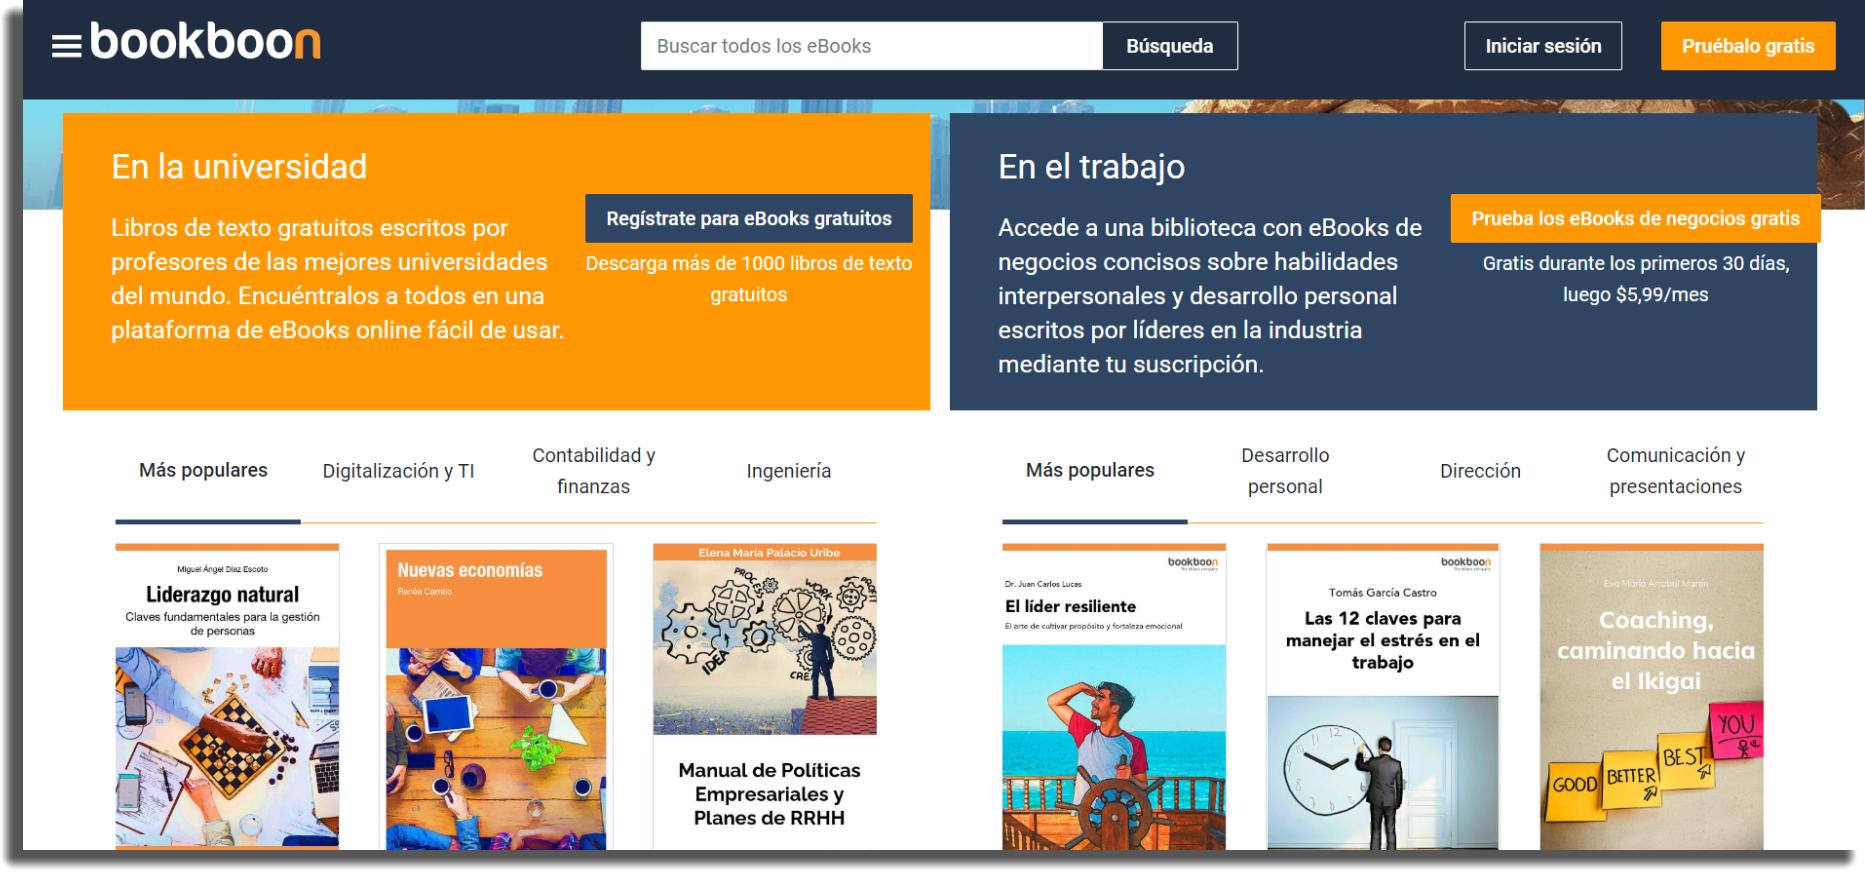 sitios web descargar libros gratis bookboon